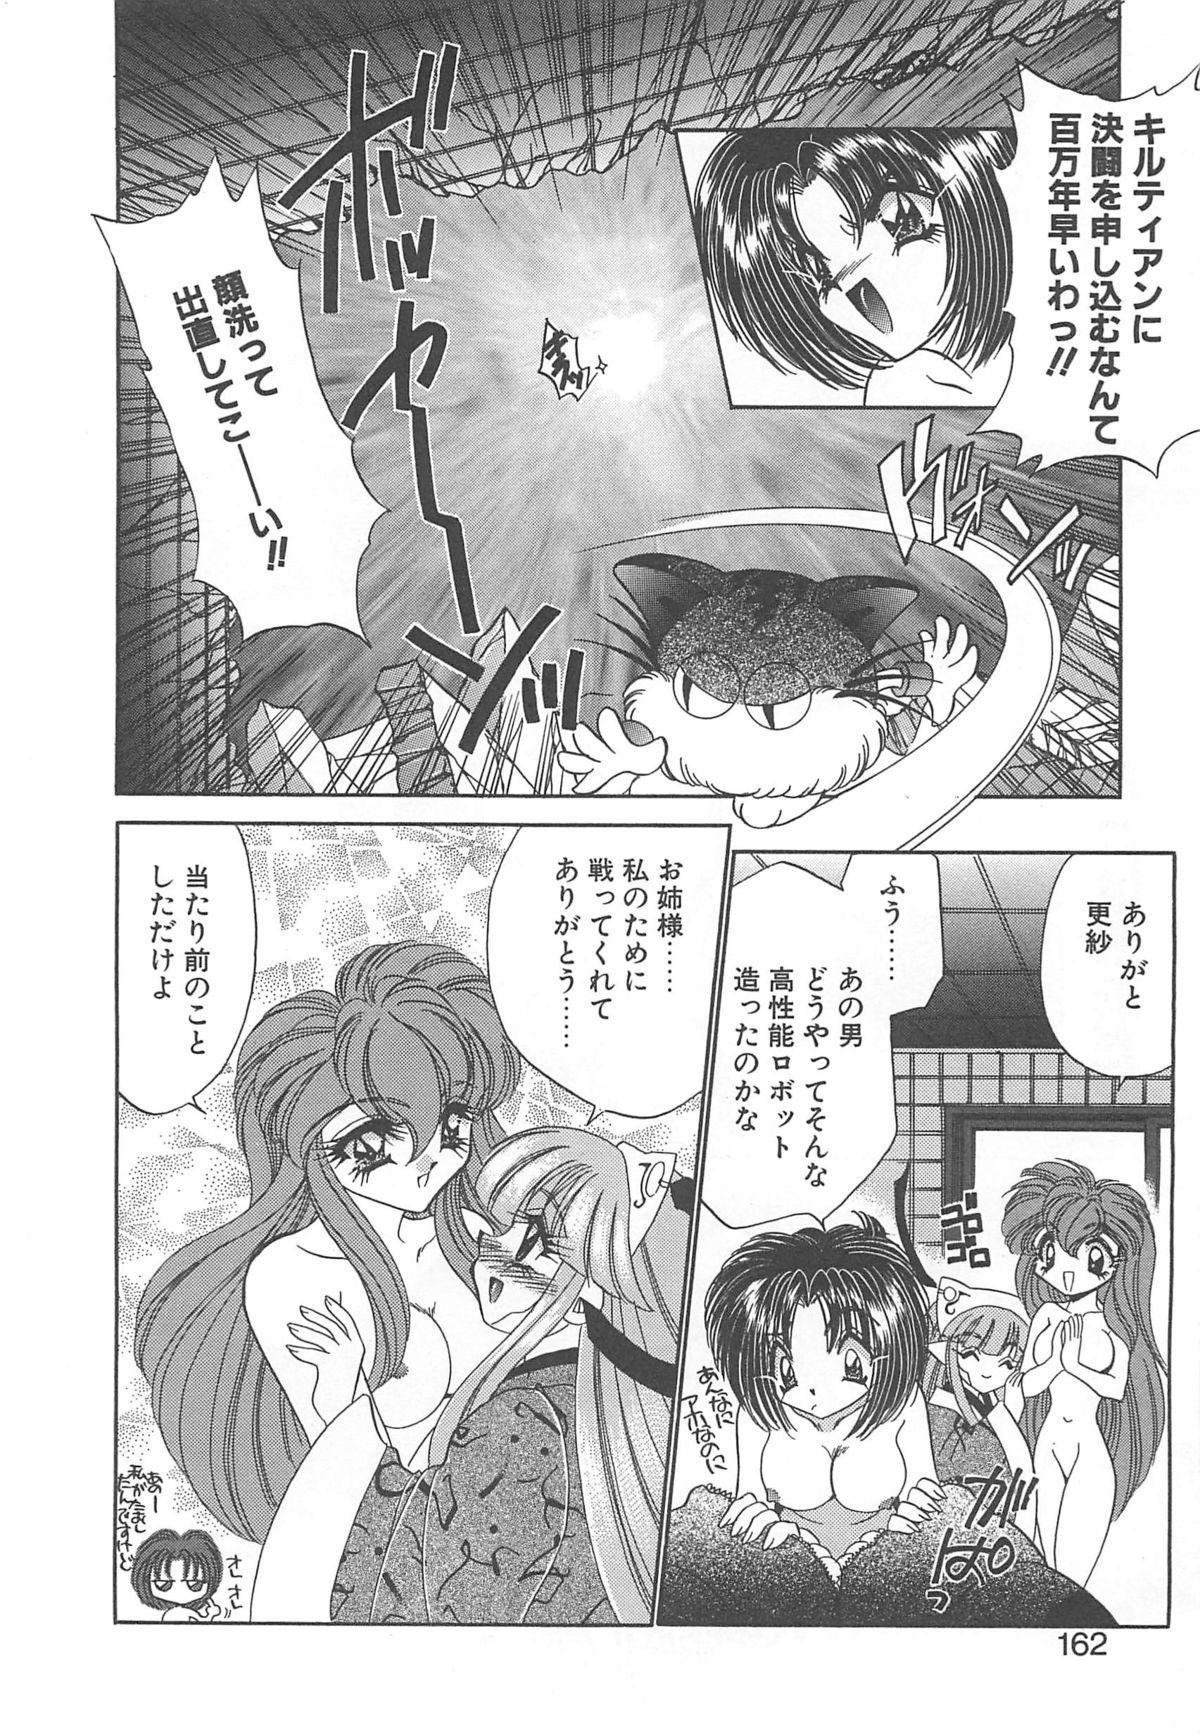 Kigurumi Sentai Quiltian 160